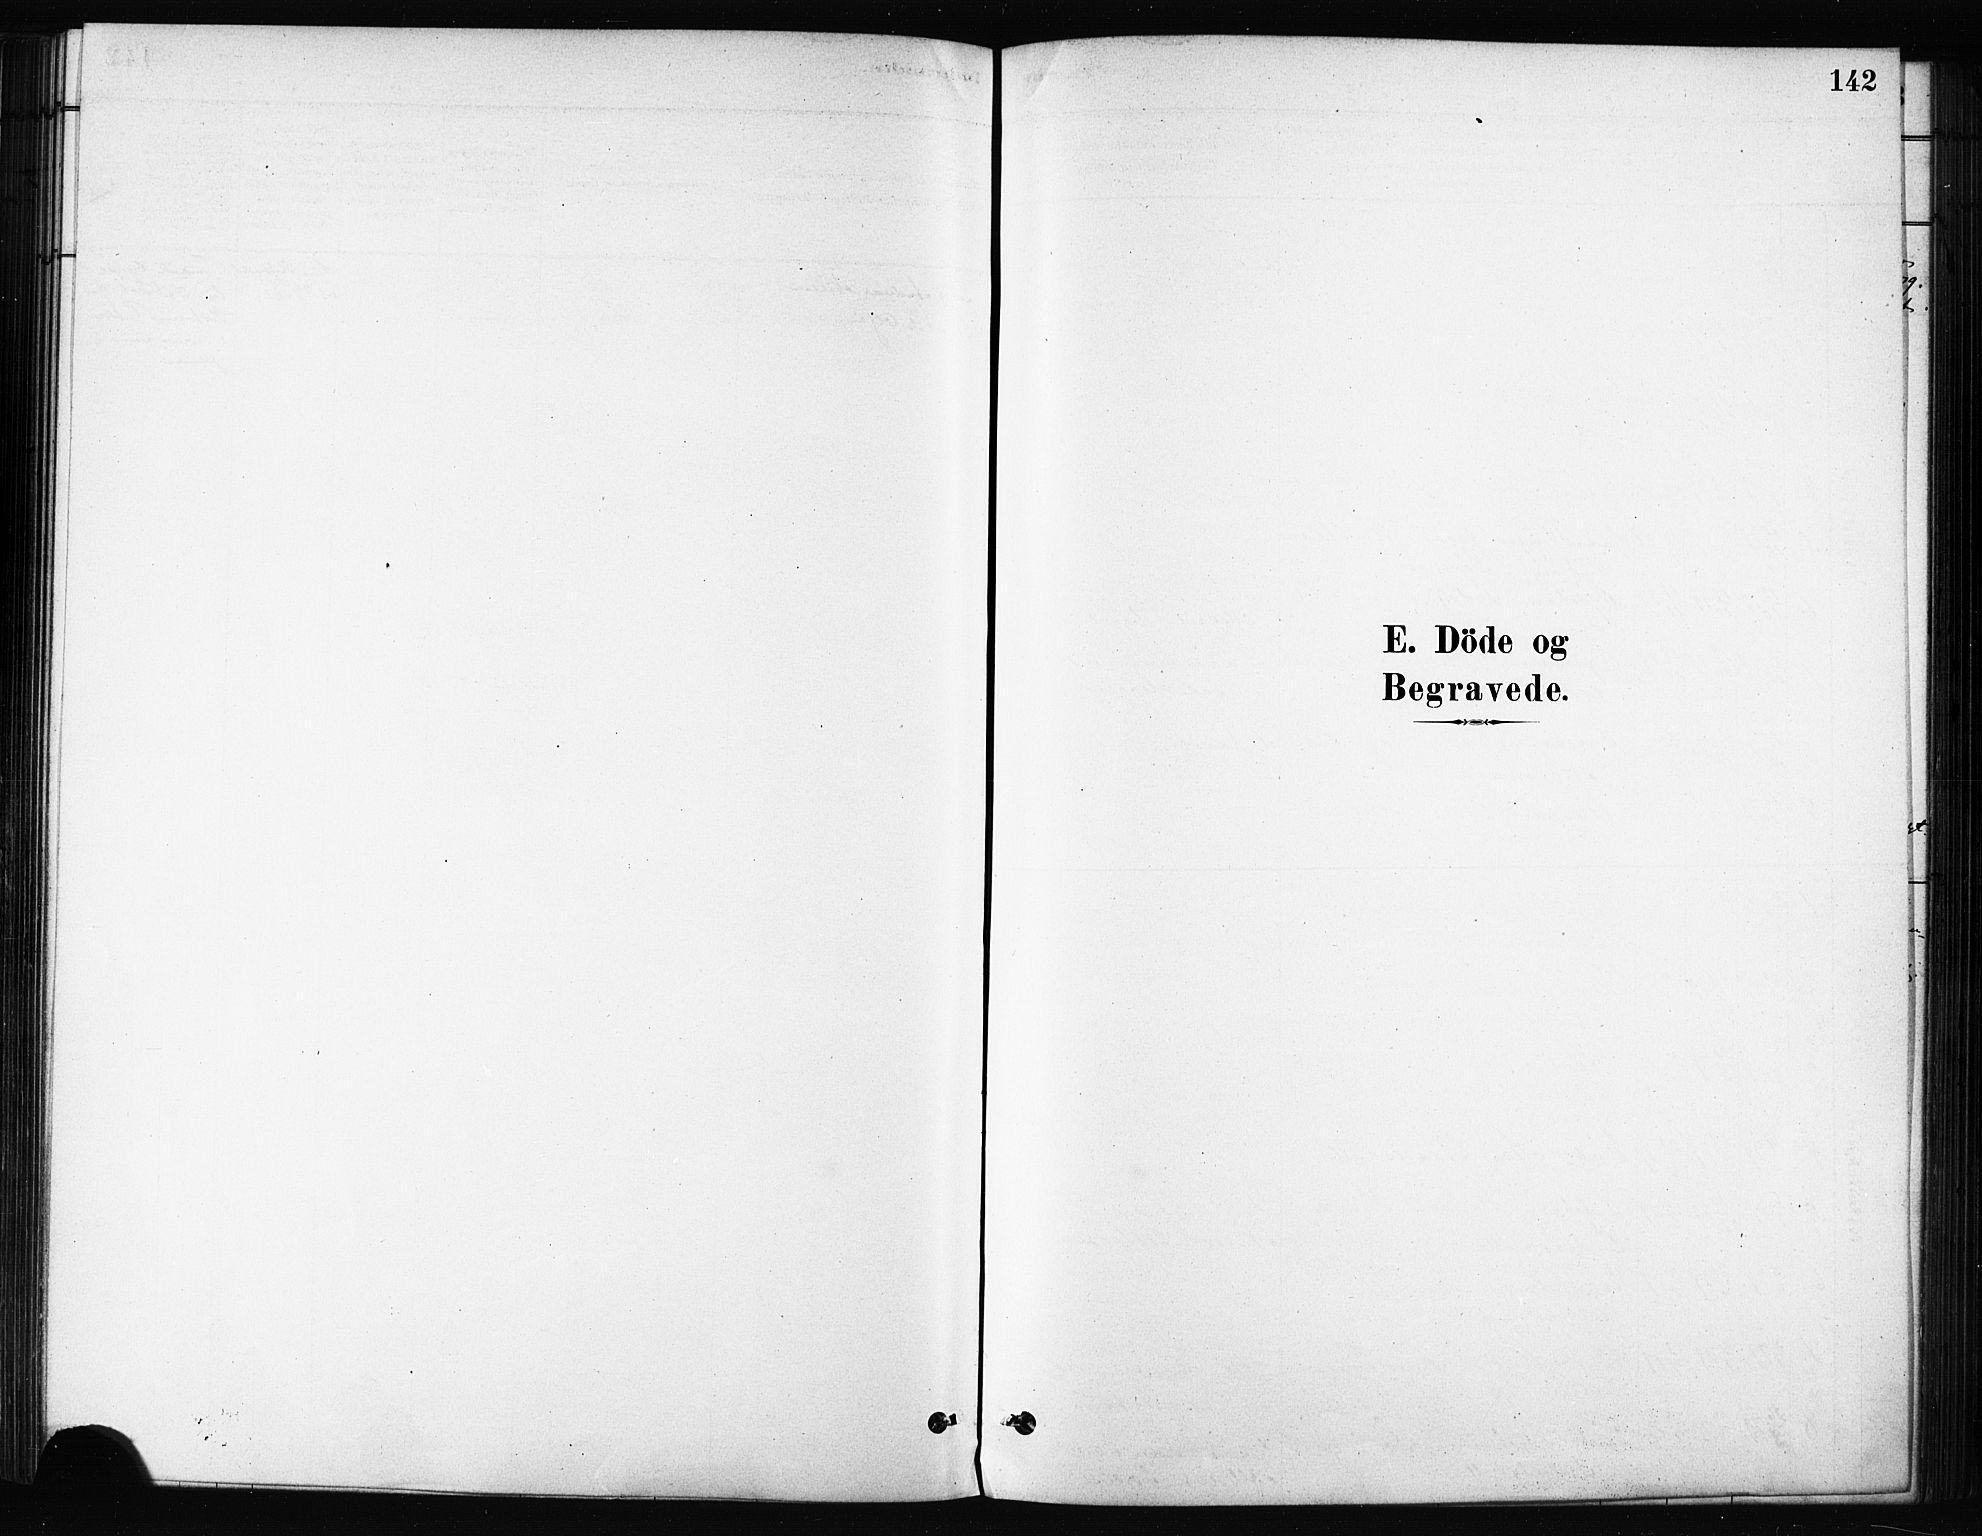 SATØ, Karlsøy sokneprestembete, H/Ha/Haa/L0011kirke: Ministerialbok nr. 11, 1879-1892, s. 142